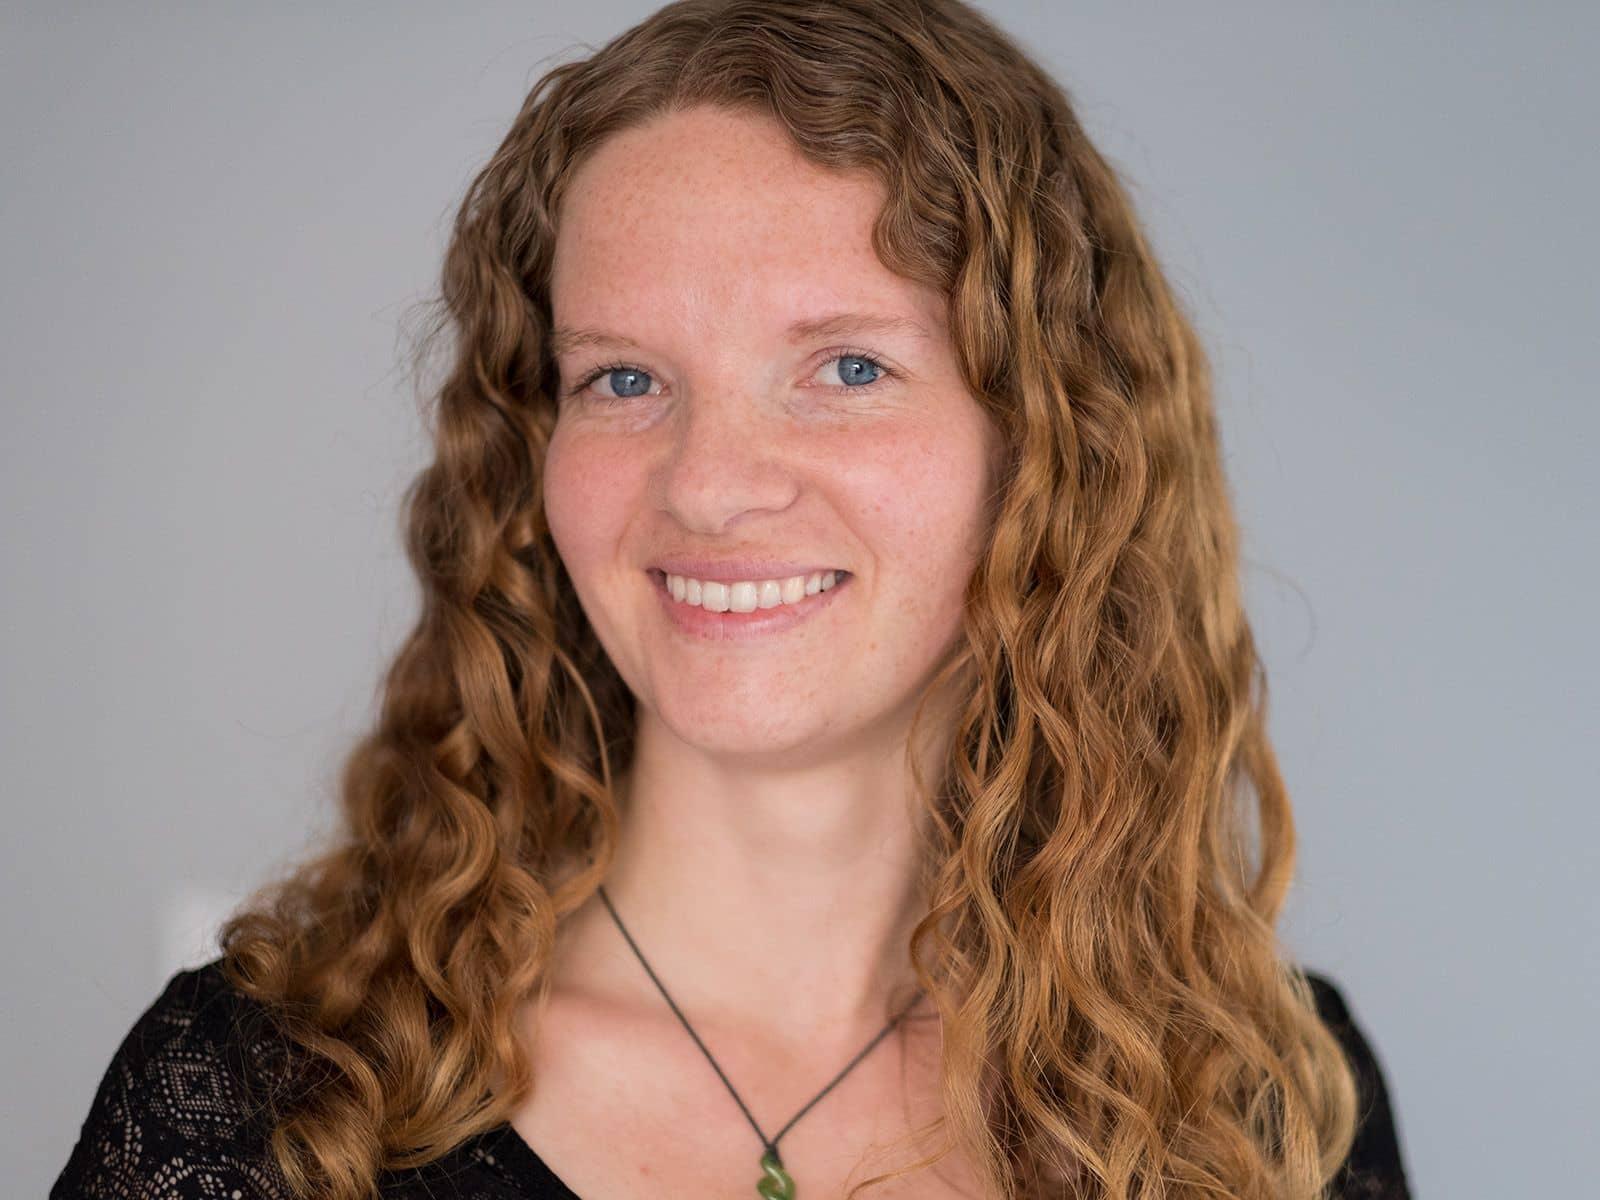 Katrin from Heidelberg, Germany